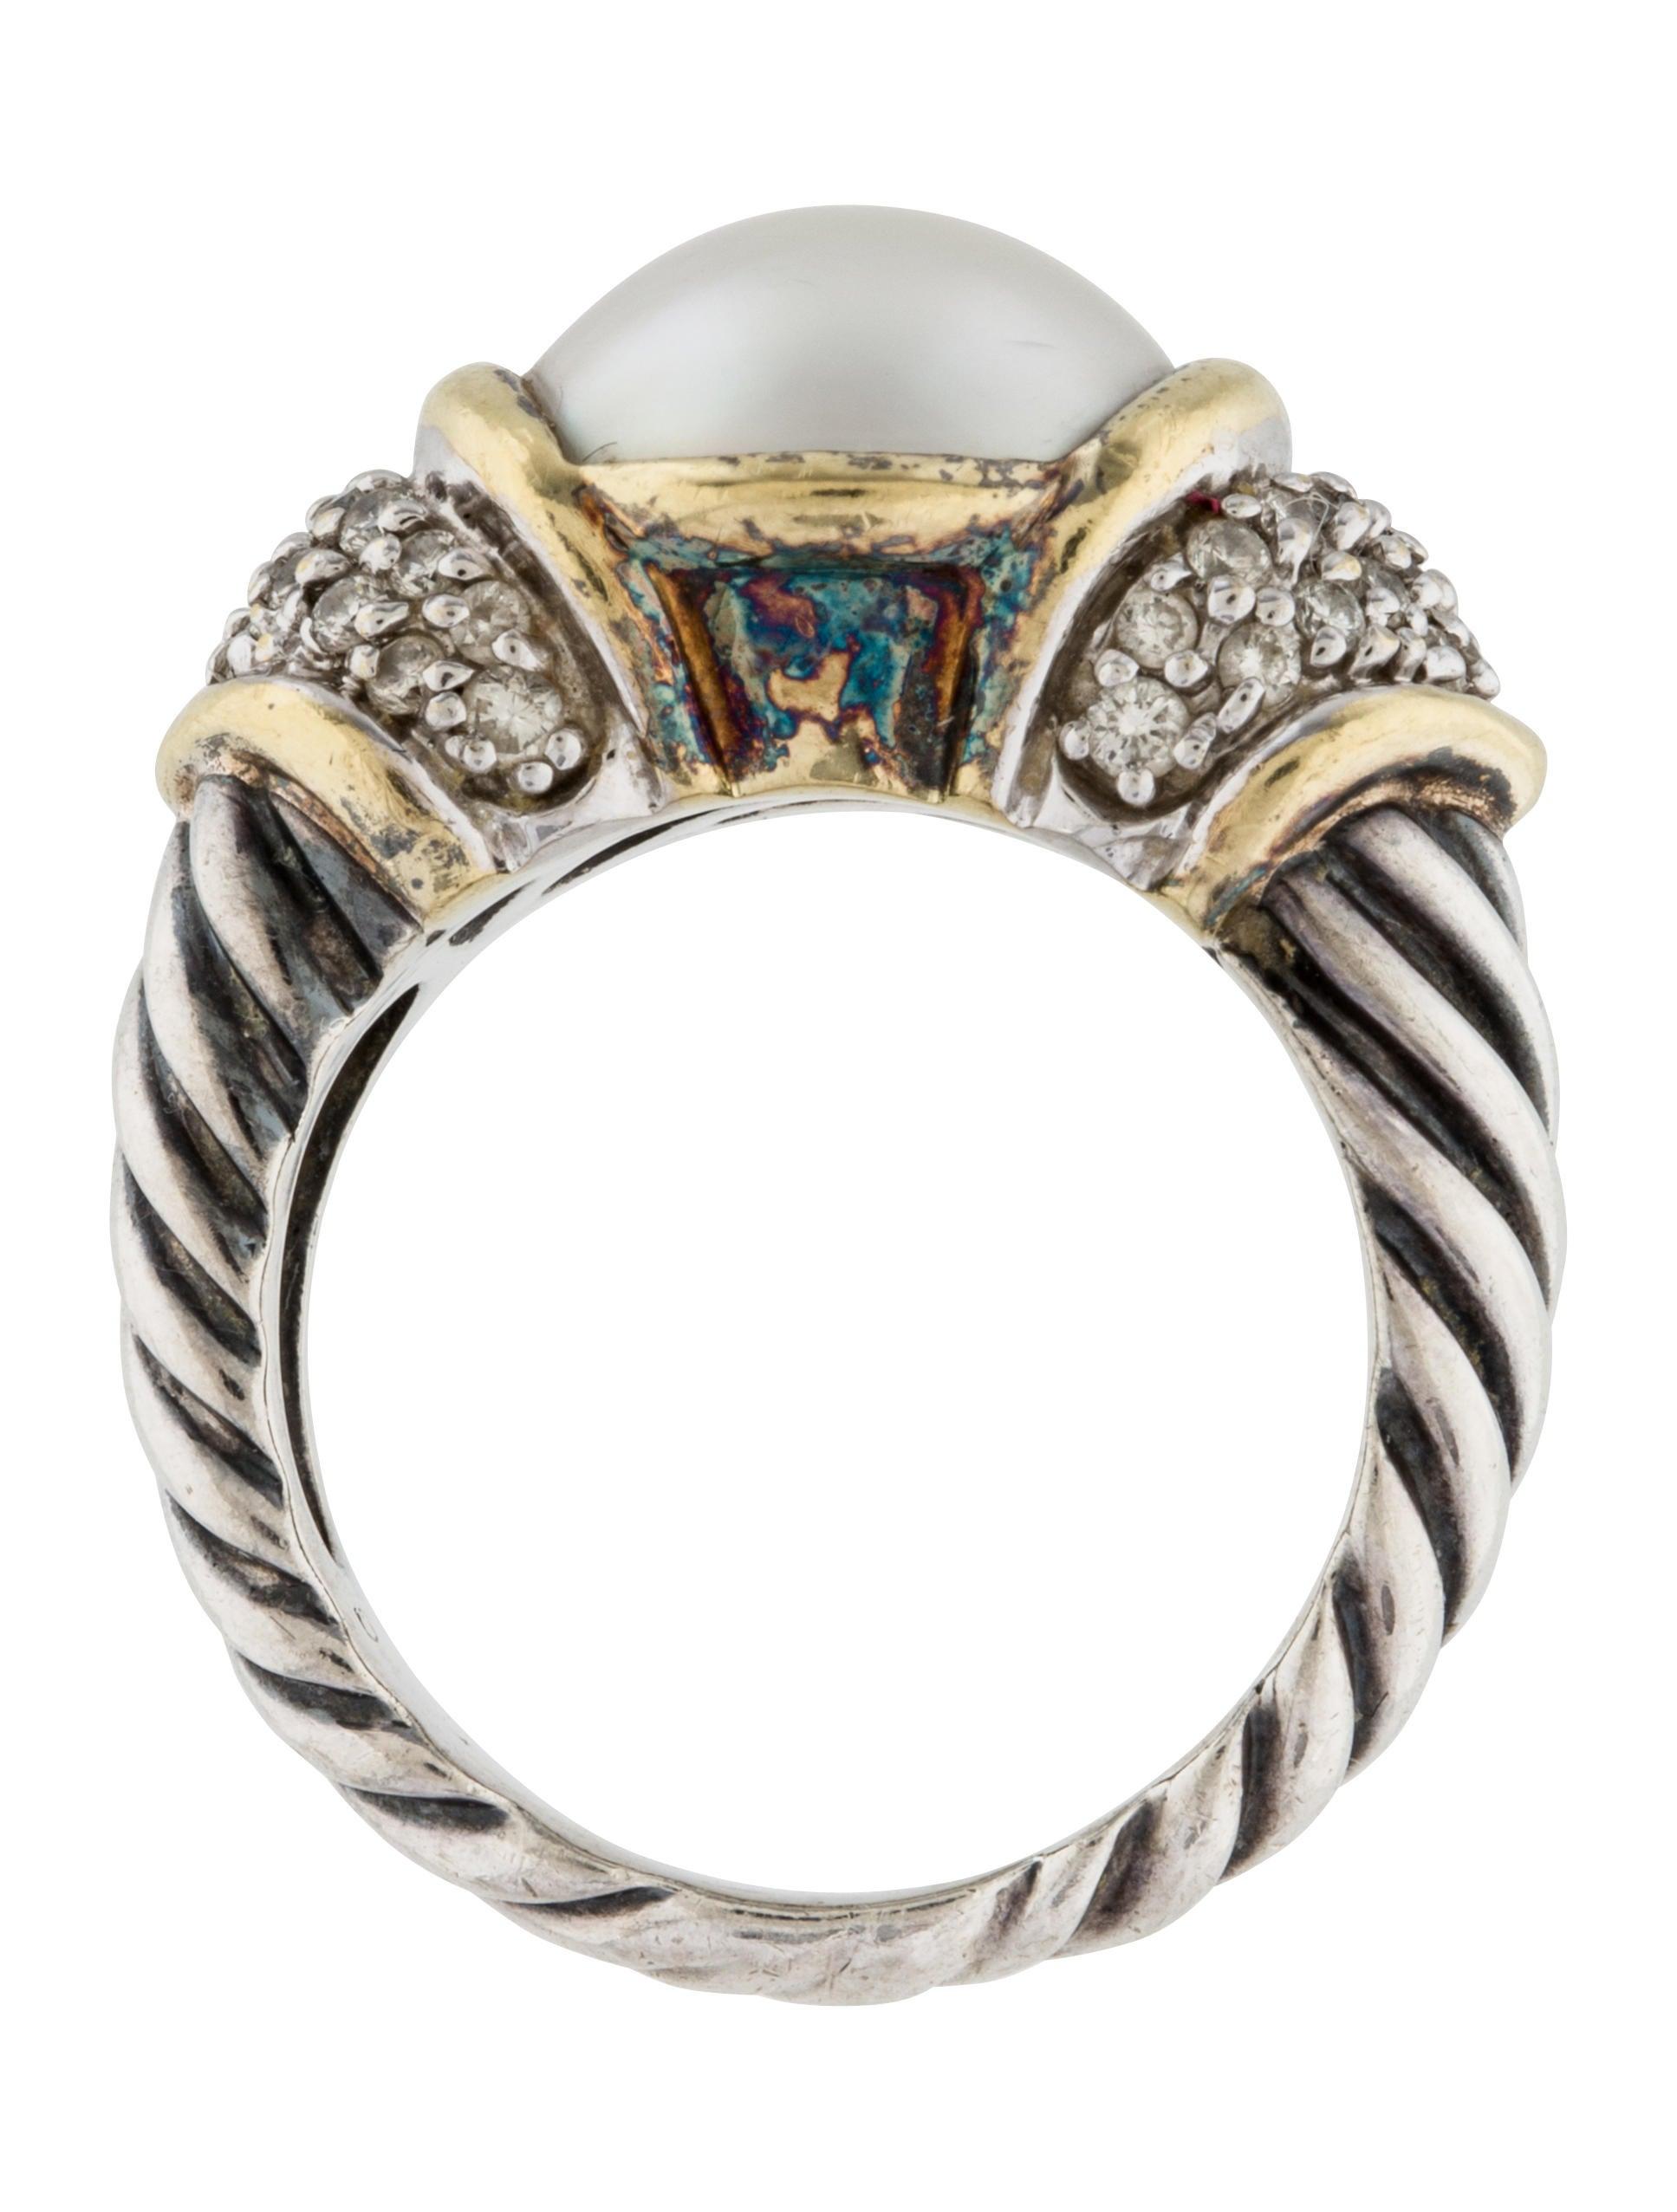 david yurman diamond mab pearl cocktail ring rings. Black Bedroom Furniture Sets. Home Design Ideas